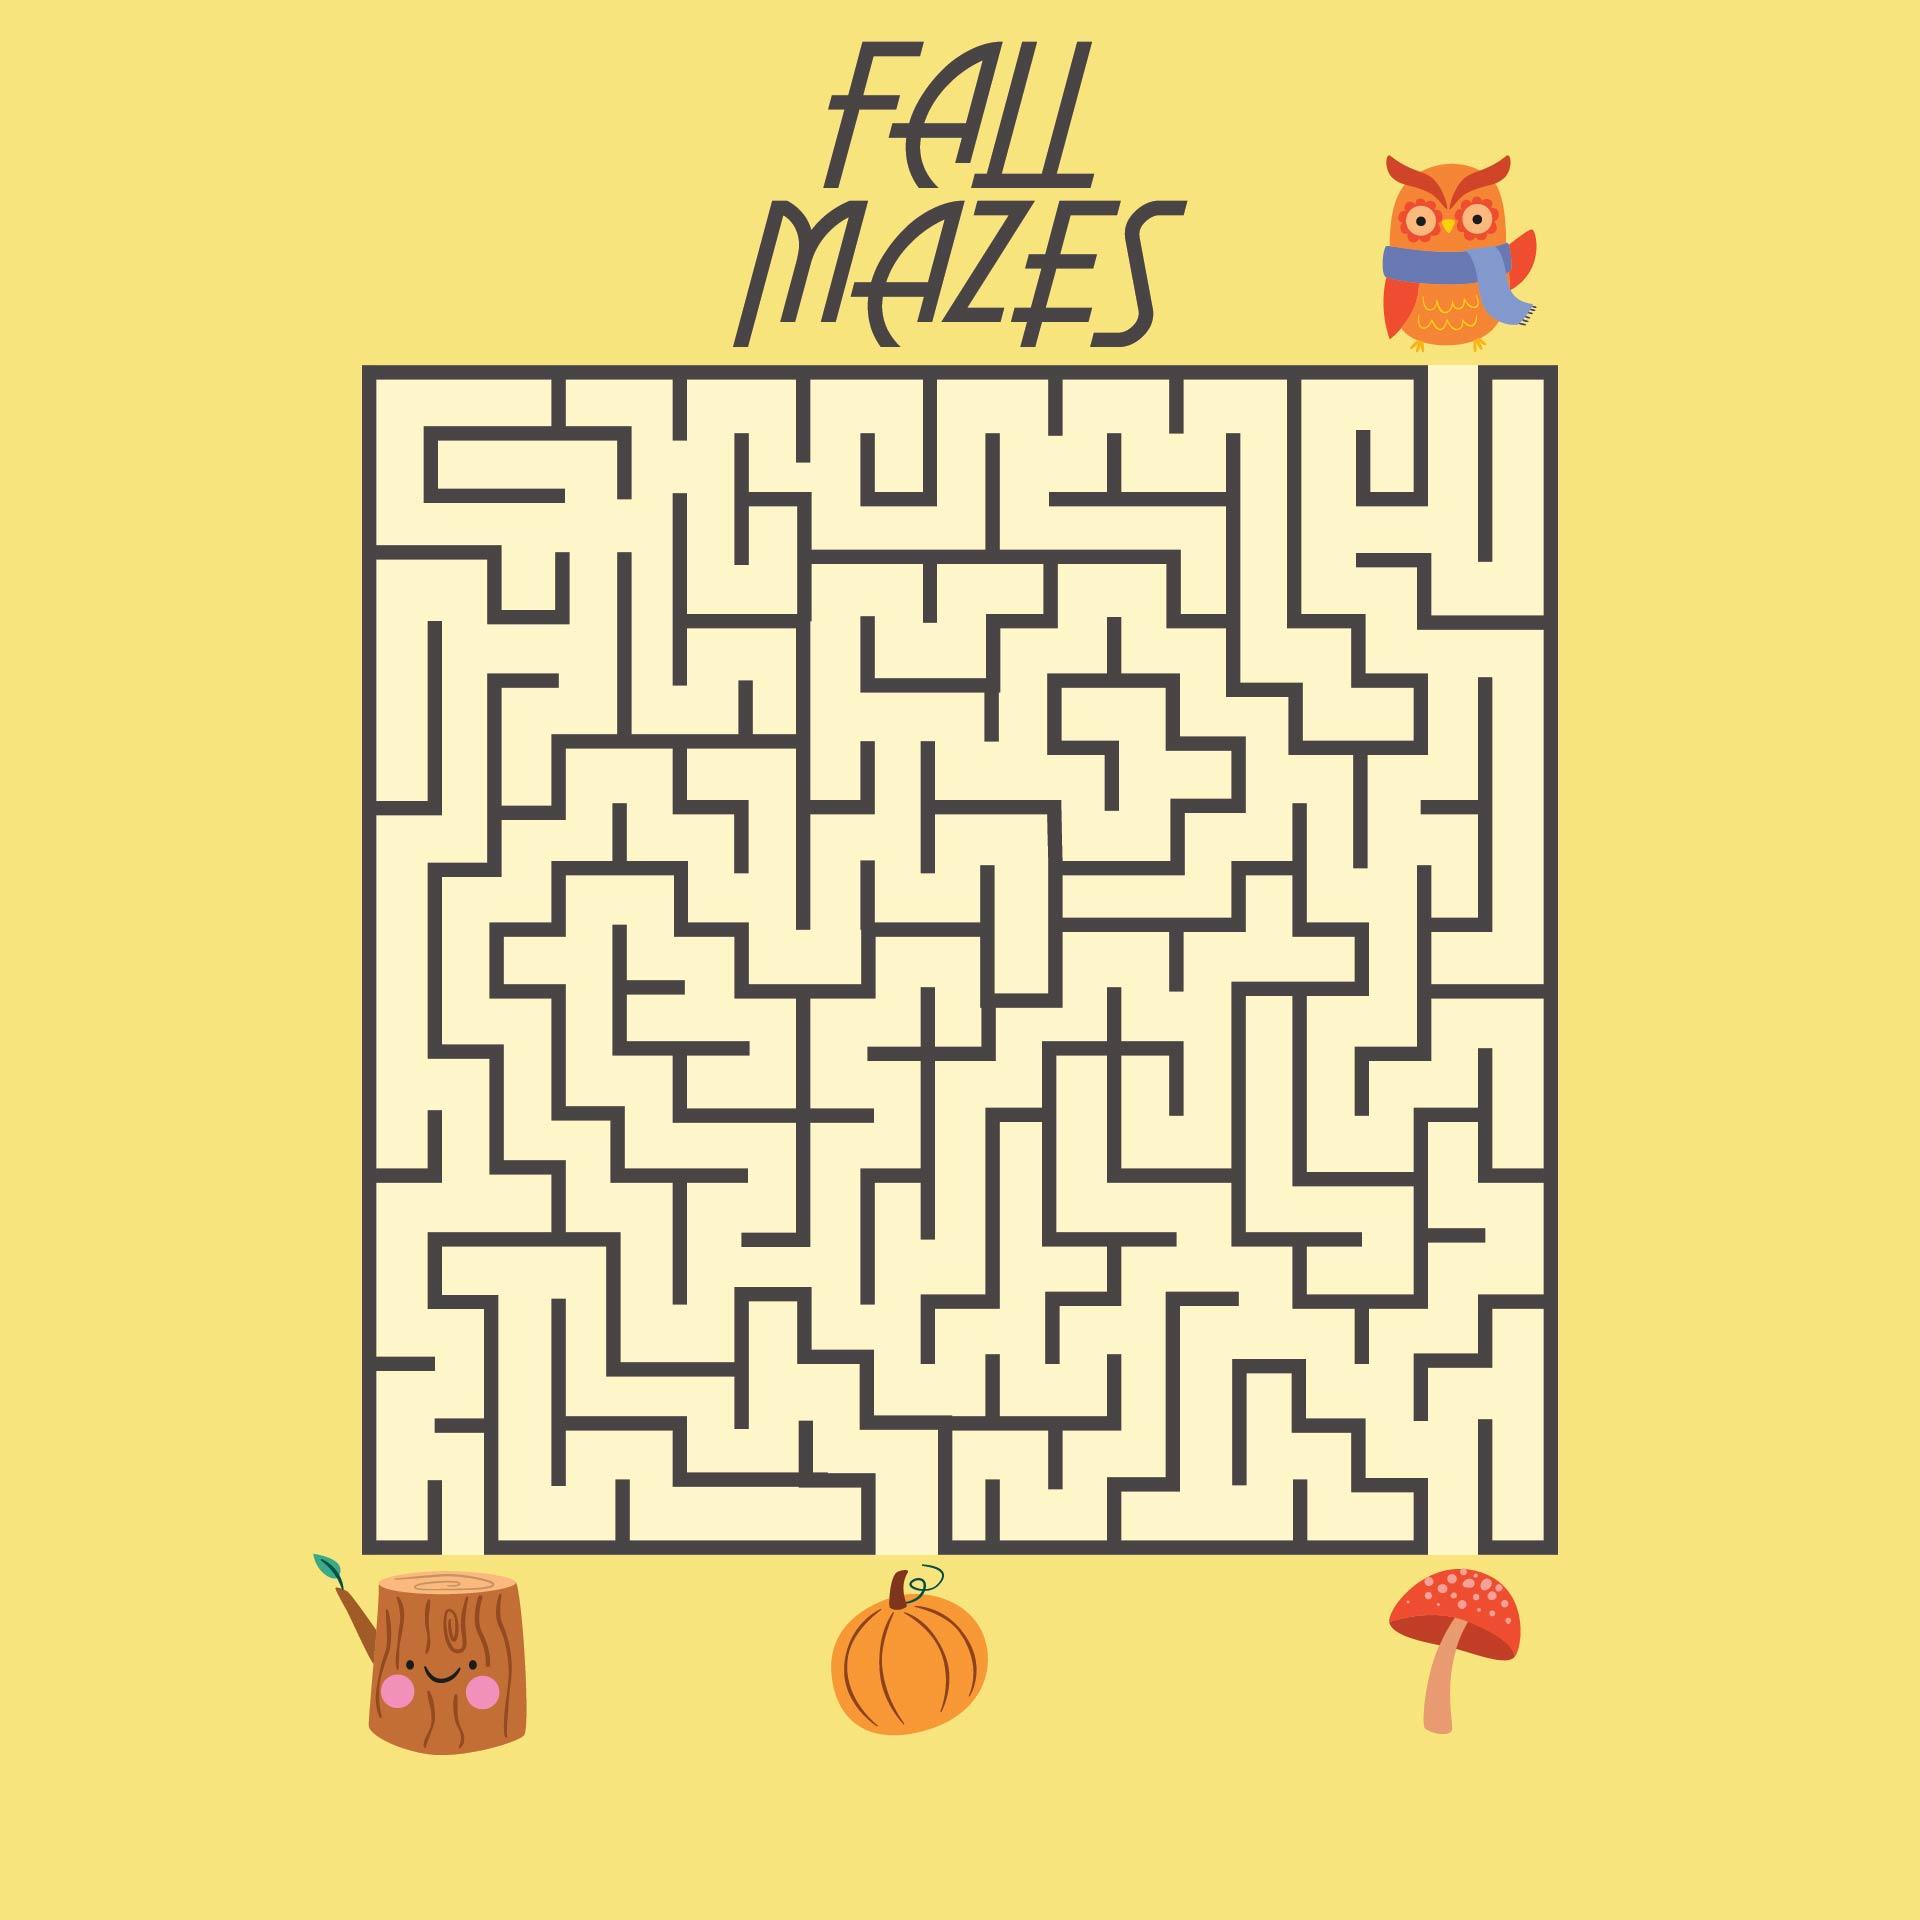 5 Images of Autumn Leaf Maze Printable